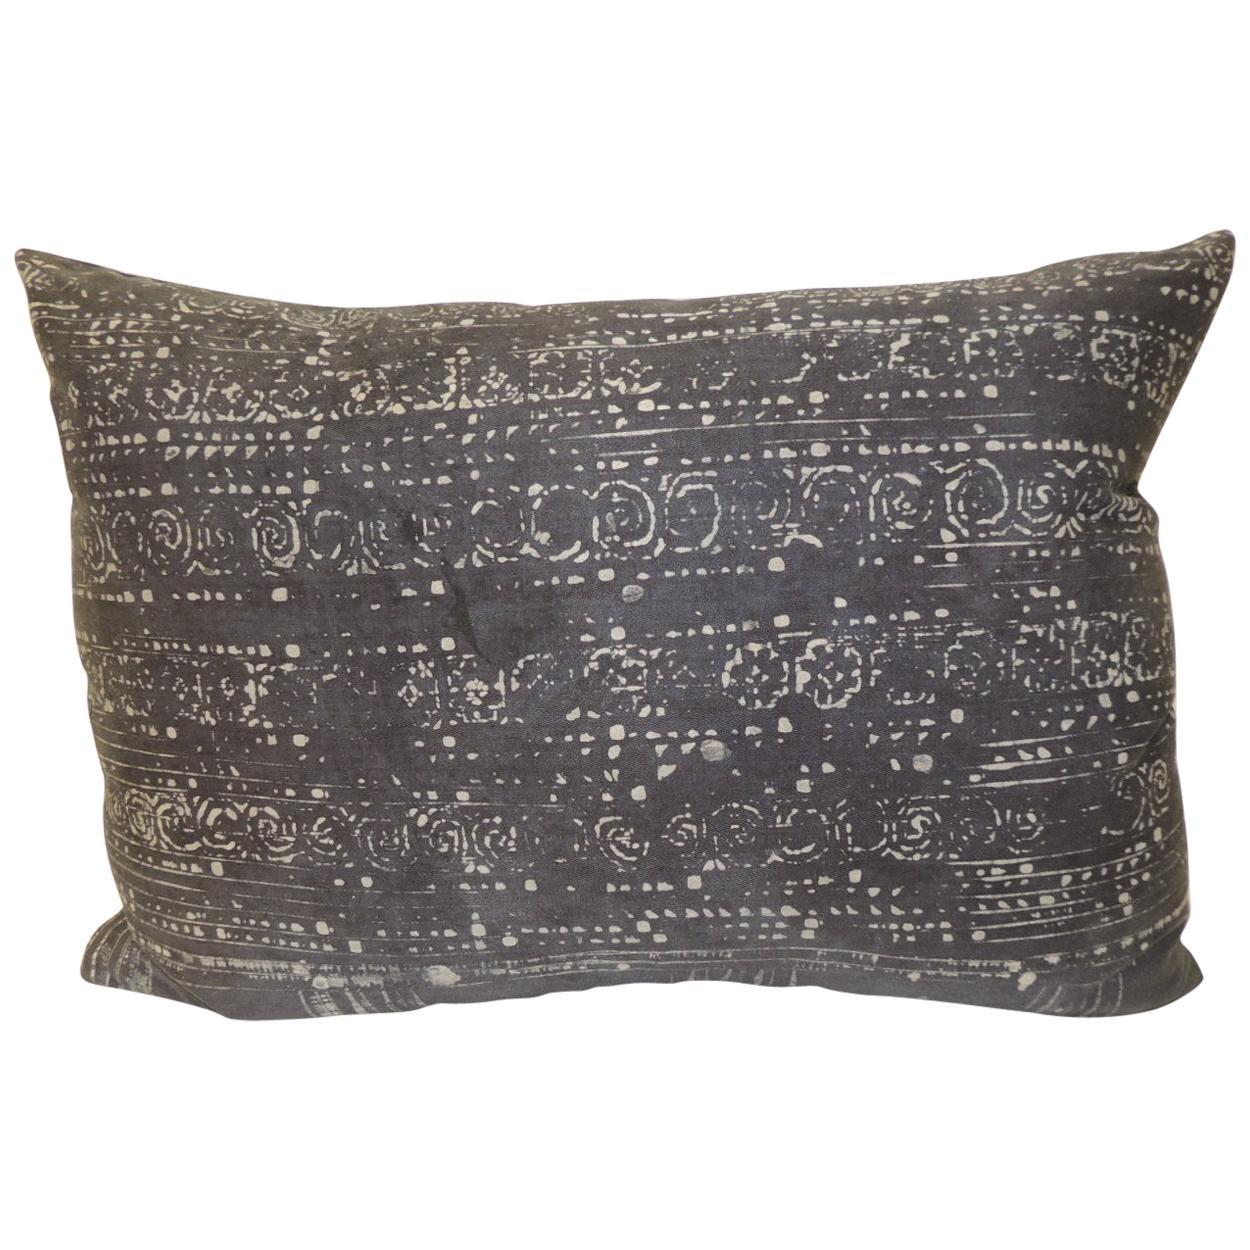 Vintage Asian Hand Blocked Batik Decorative Bolster Pillow